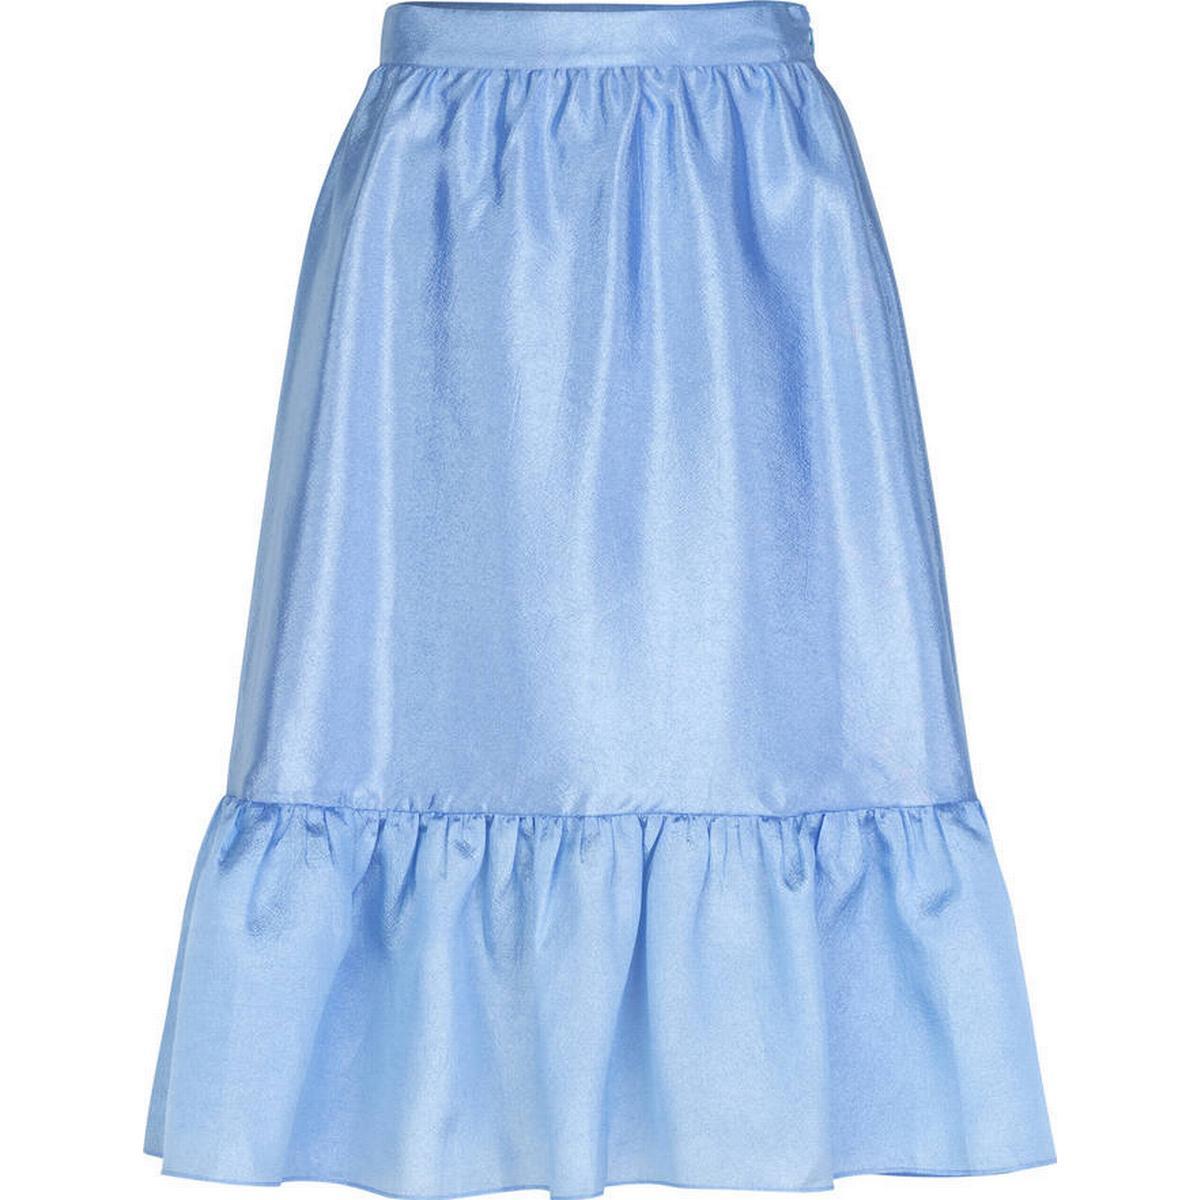 96b7323c107f Stine Goya Nederdele Dametøj - Sammenlign priser hos PriceRunner